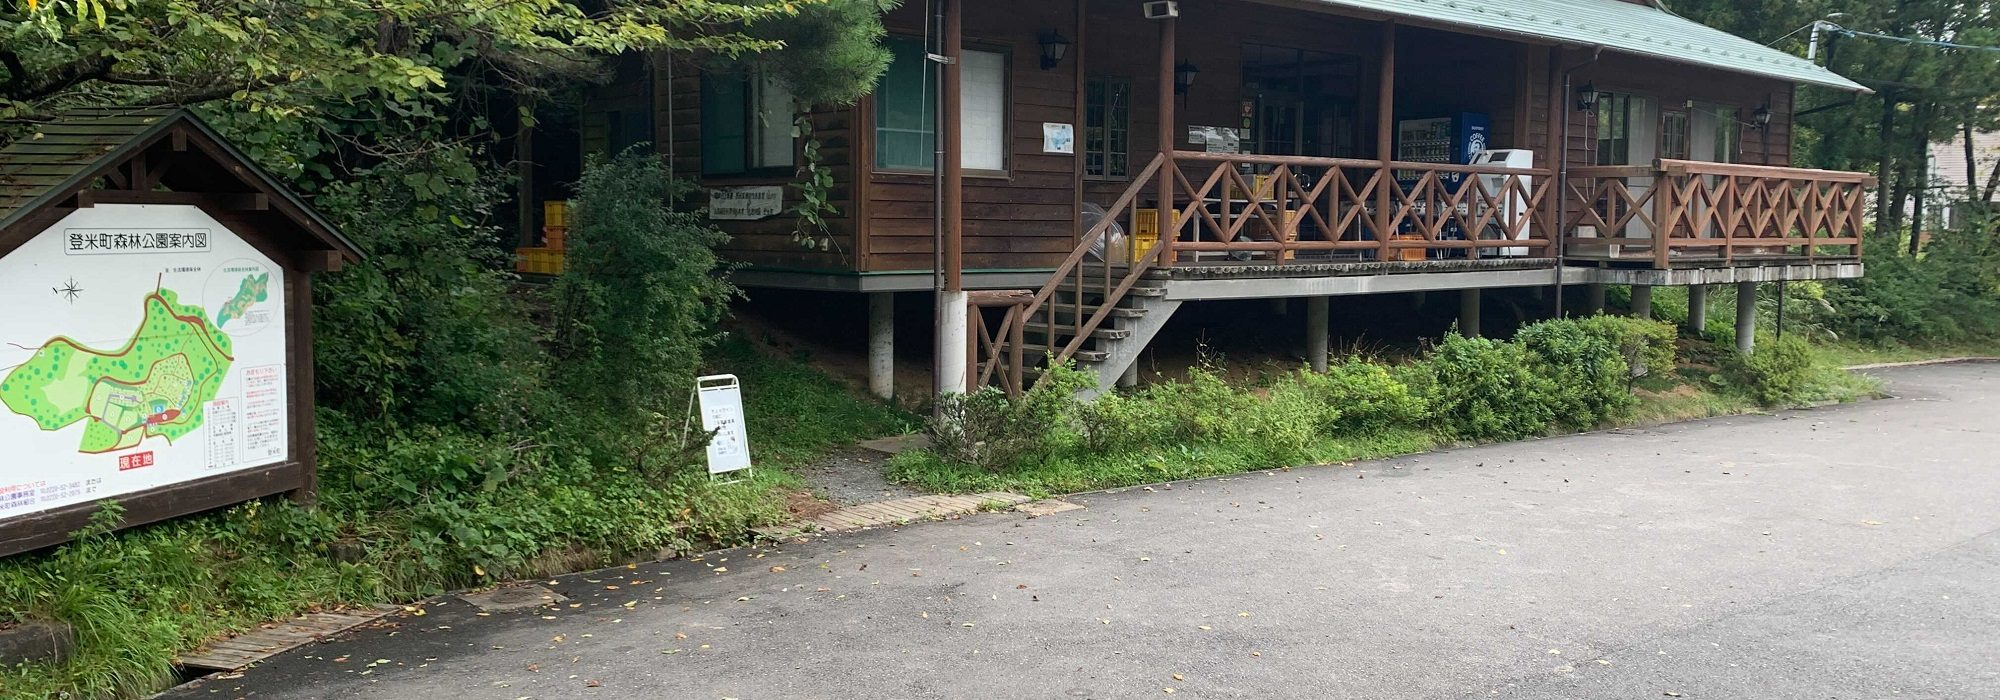 登米森林公園の管理棟